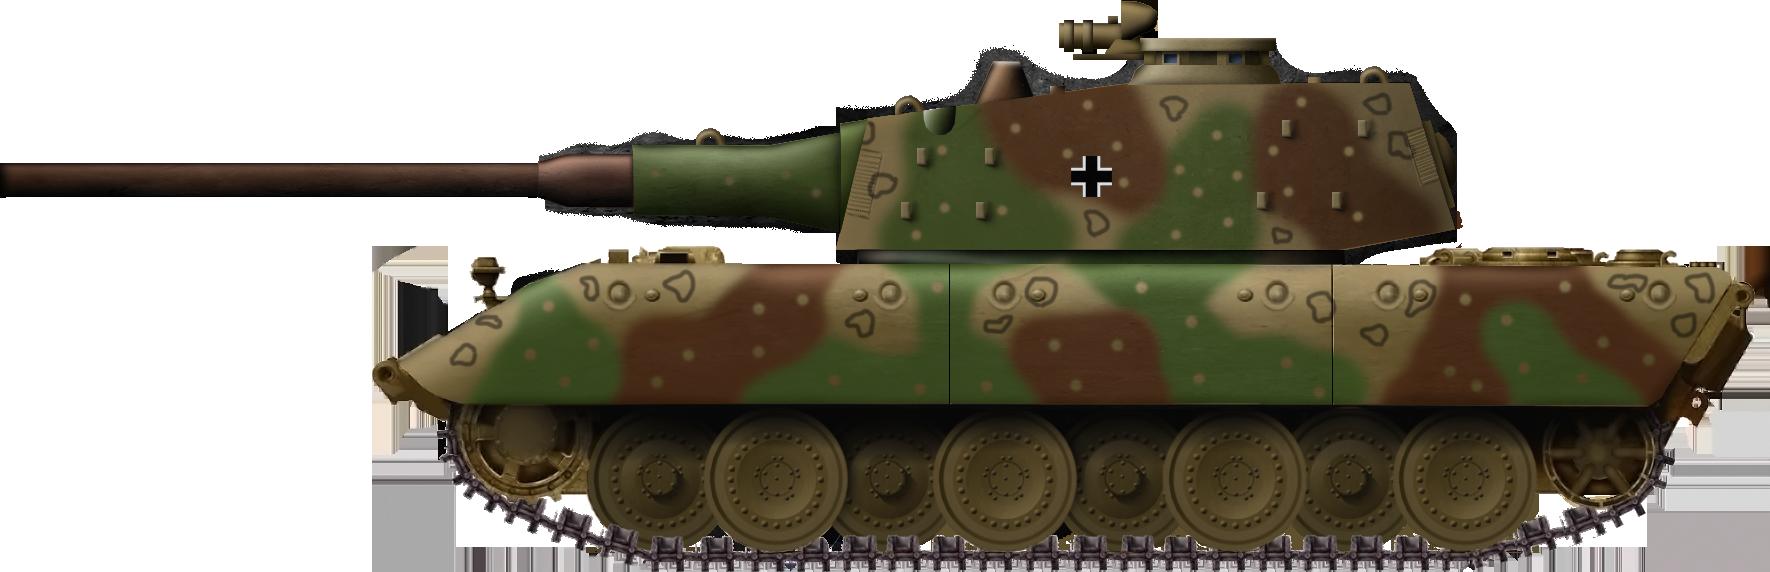 E-100 Ausf. B (Henschelturm or Rinaldi's turret)